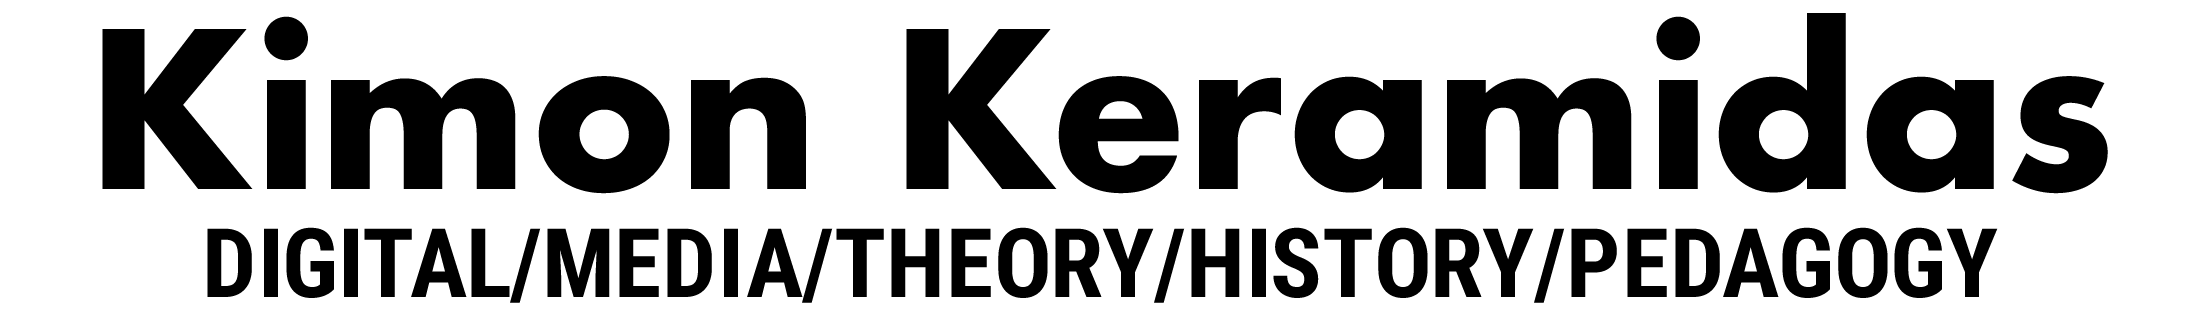 Kimon Keramidas Retina Logo